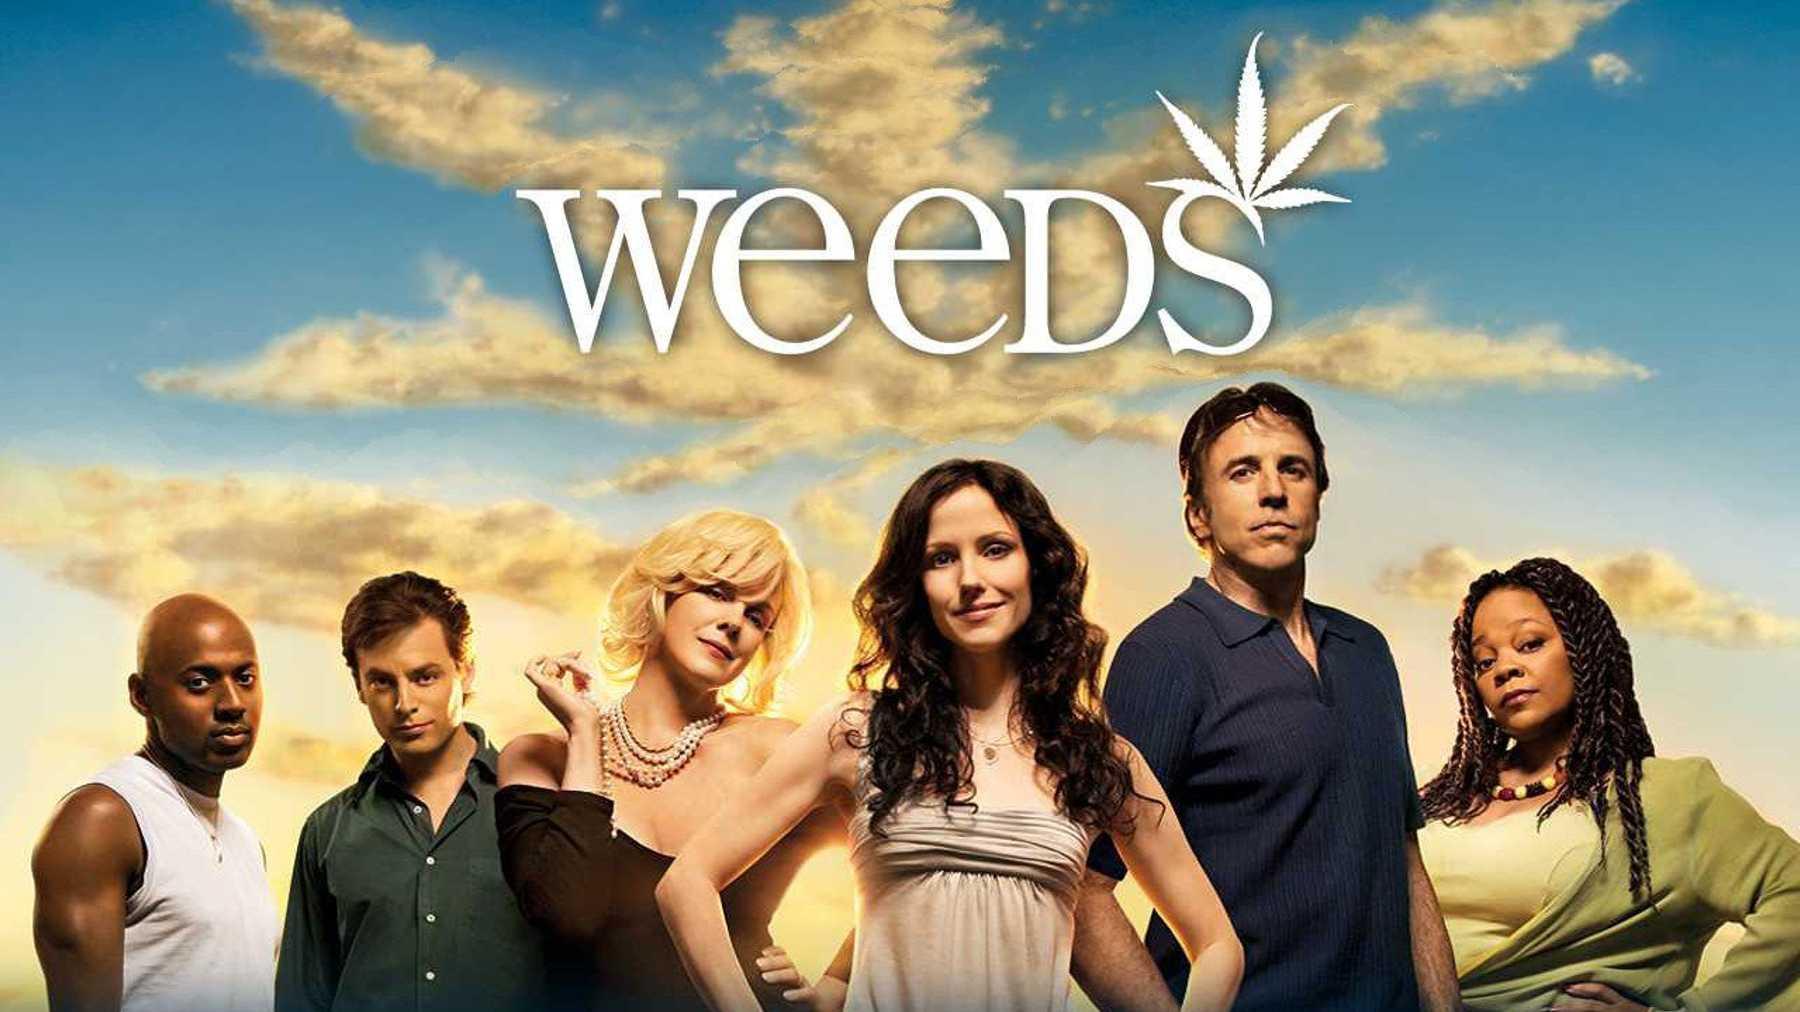 Serial Trawka (Weeds)